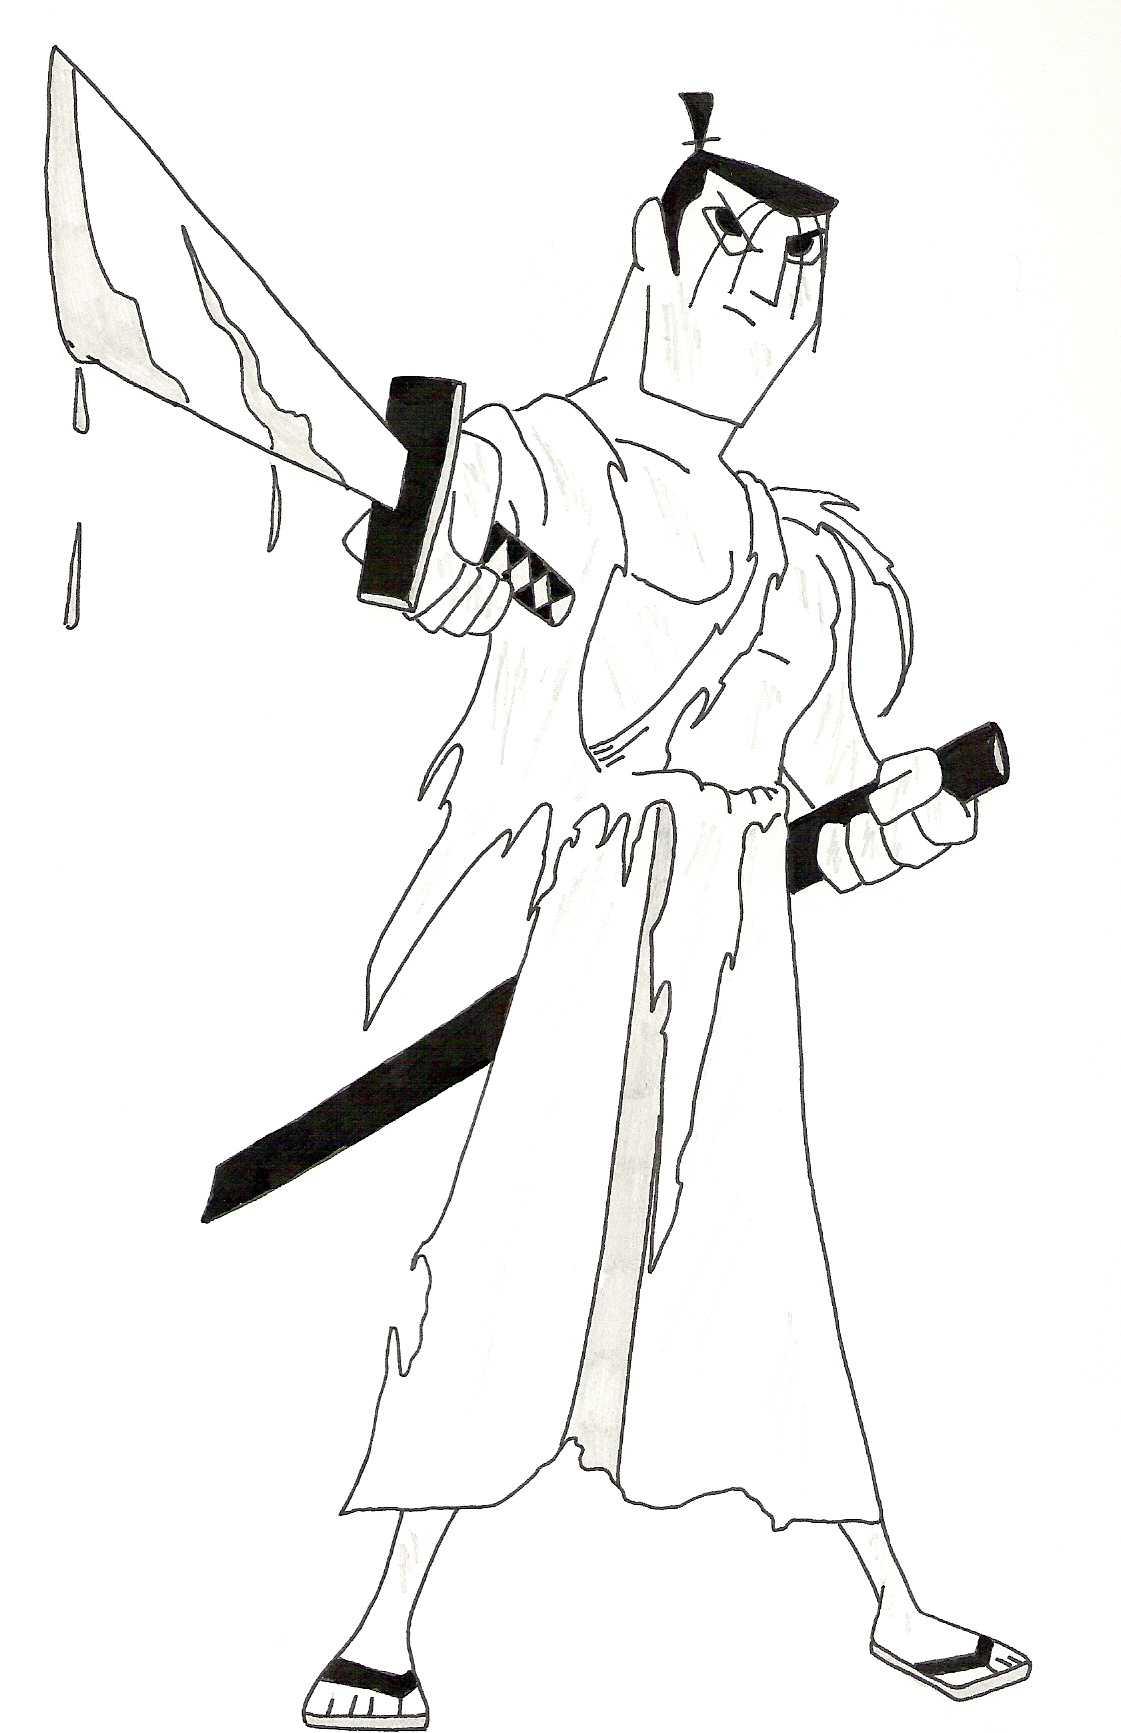 Drawn samurai samurai jack Genndy follows animated Samurai Genndy